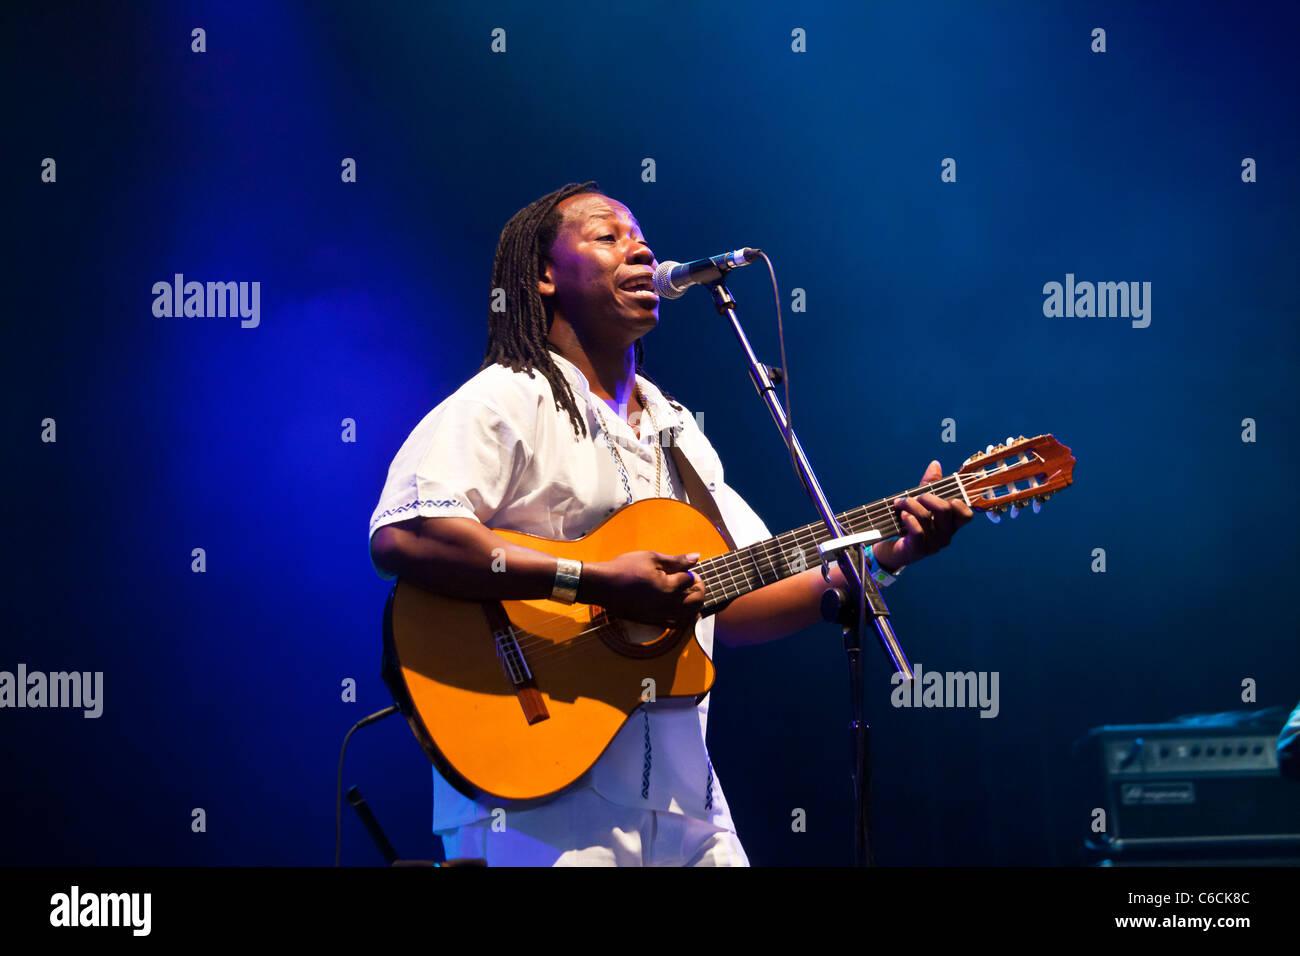 Aurelio Martinez, Honduran singer and guitarist, performing at WOMAD 2011, Charlton Park, Malmesbury, England, UK - Stock Image